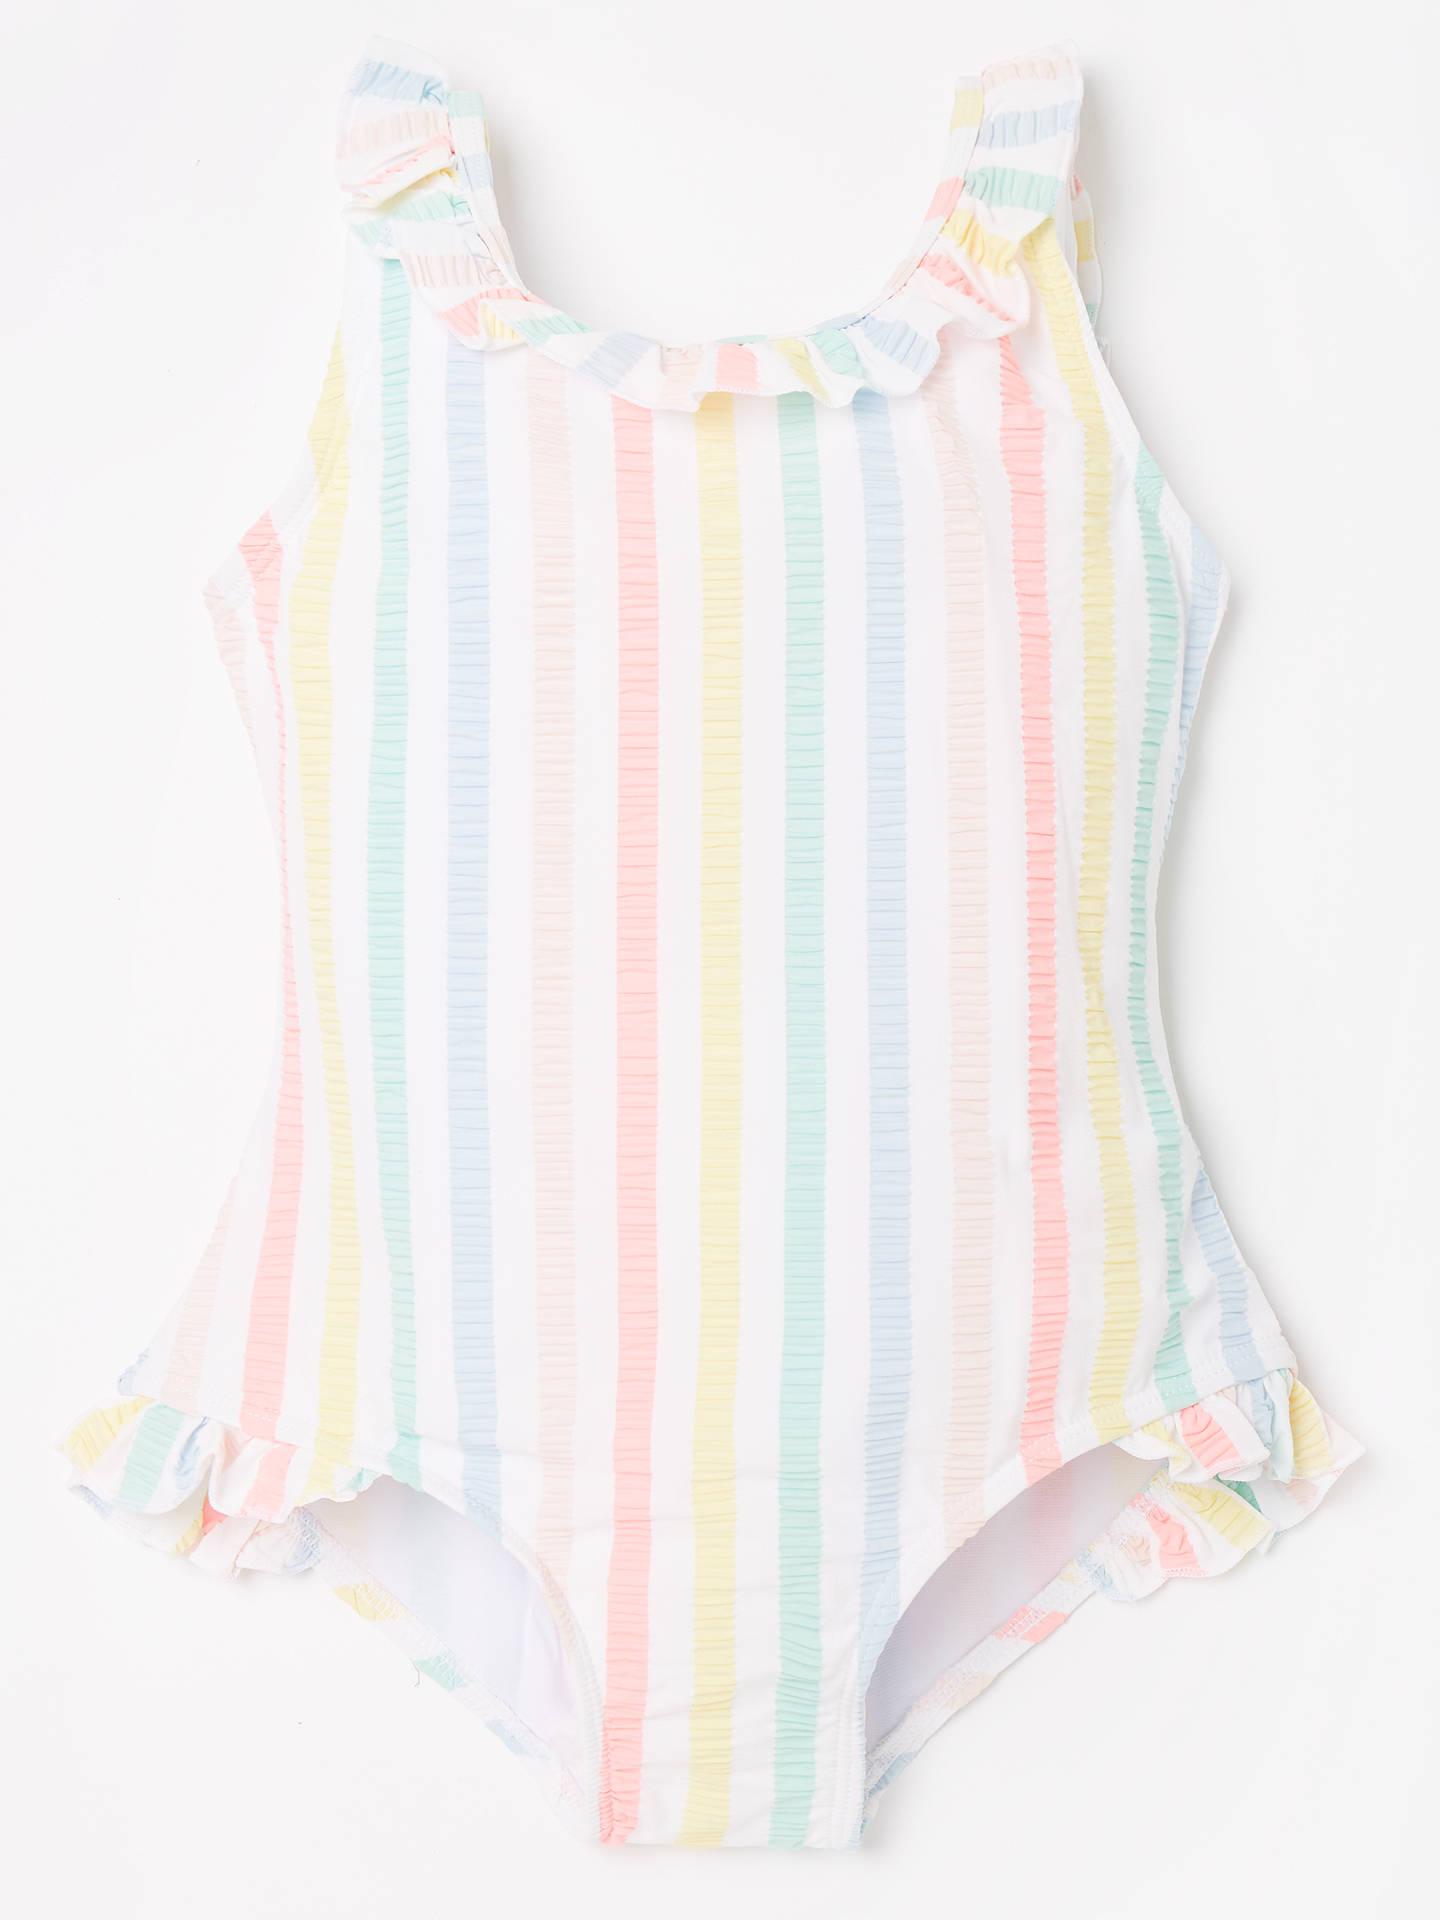 df72382e03 Buy John Lewis & Partners Girls' Rainbow Seersucker Stripe Swimsuit, Multi,  7 years ...